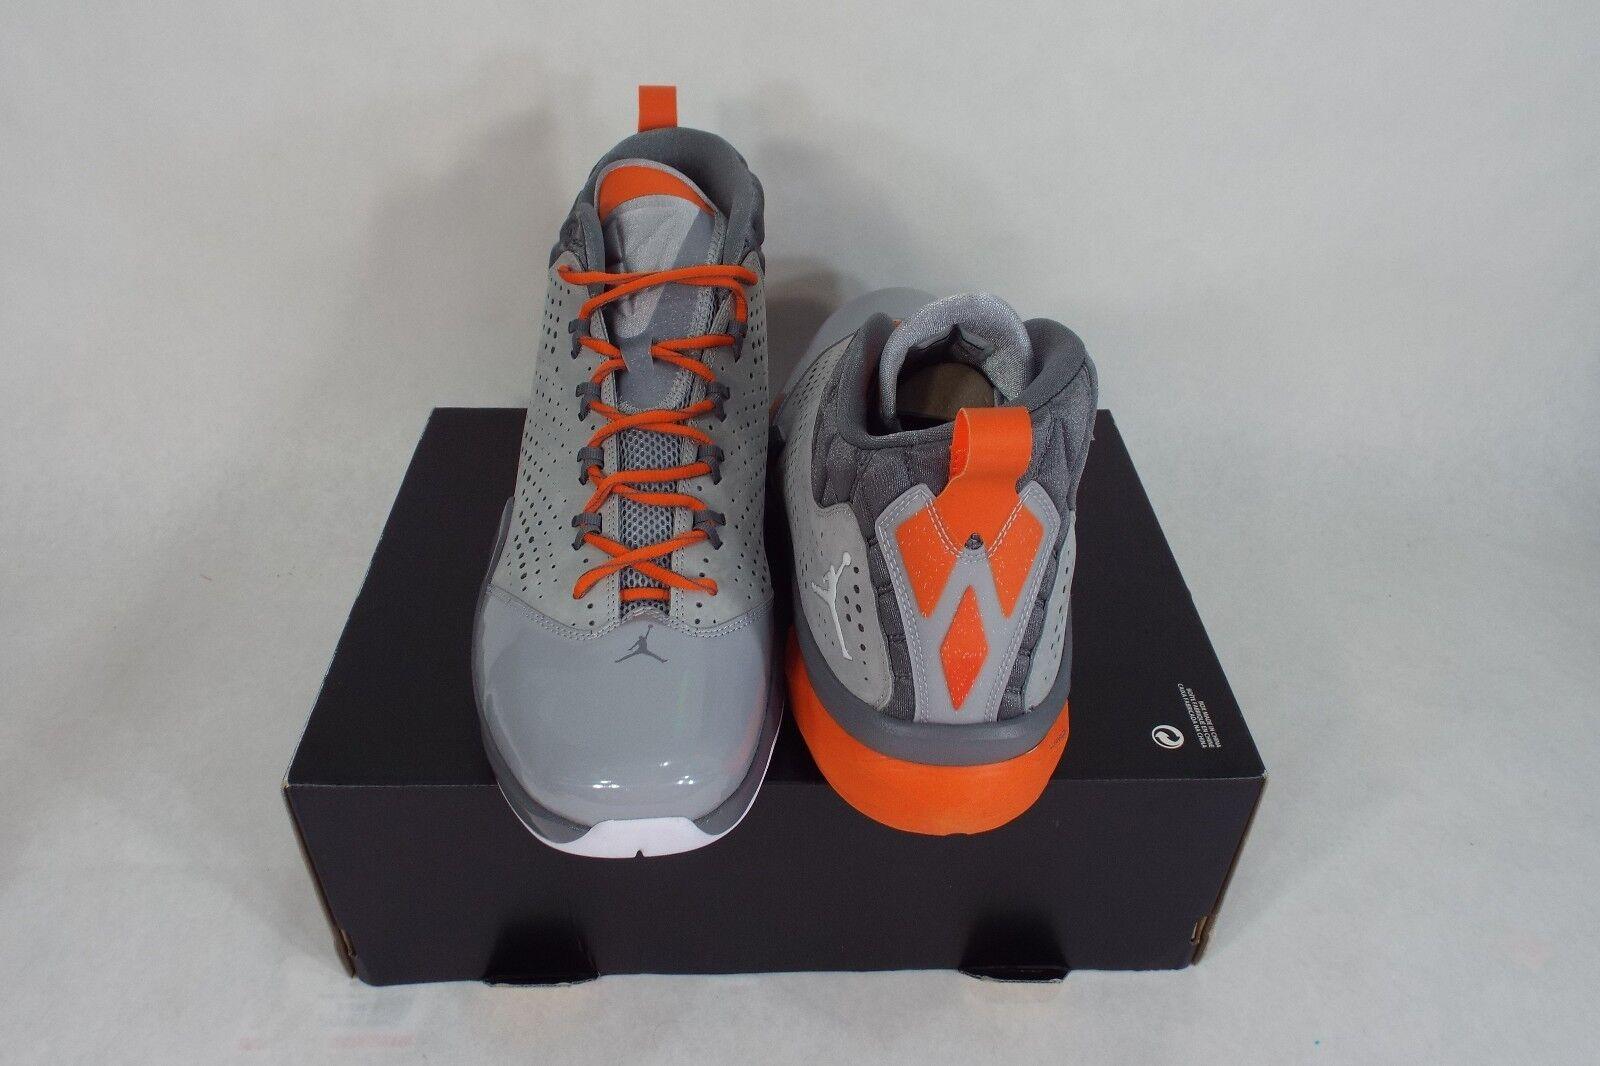 RARE SAMPLE New Hommes 9 NIKE Jordan Gris Flight Time 14.5 Gris Jordan  Chaussures  130 654272-017 837c8c